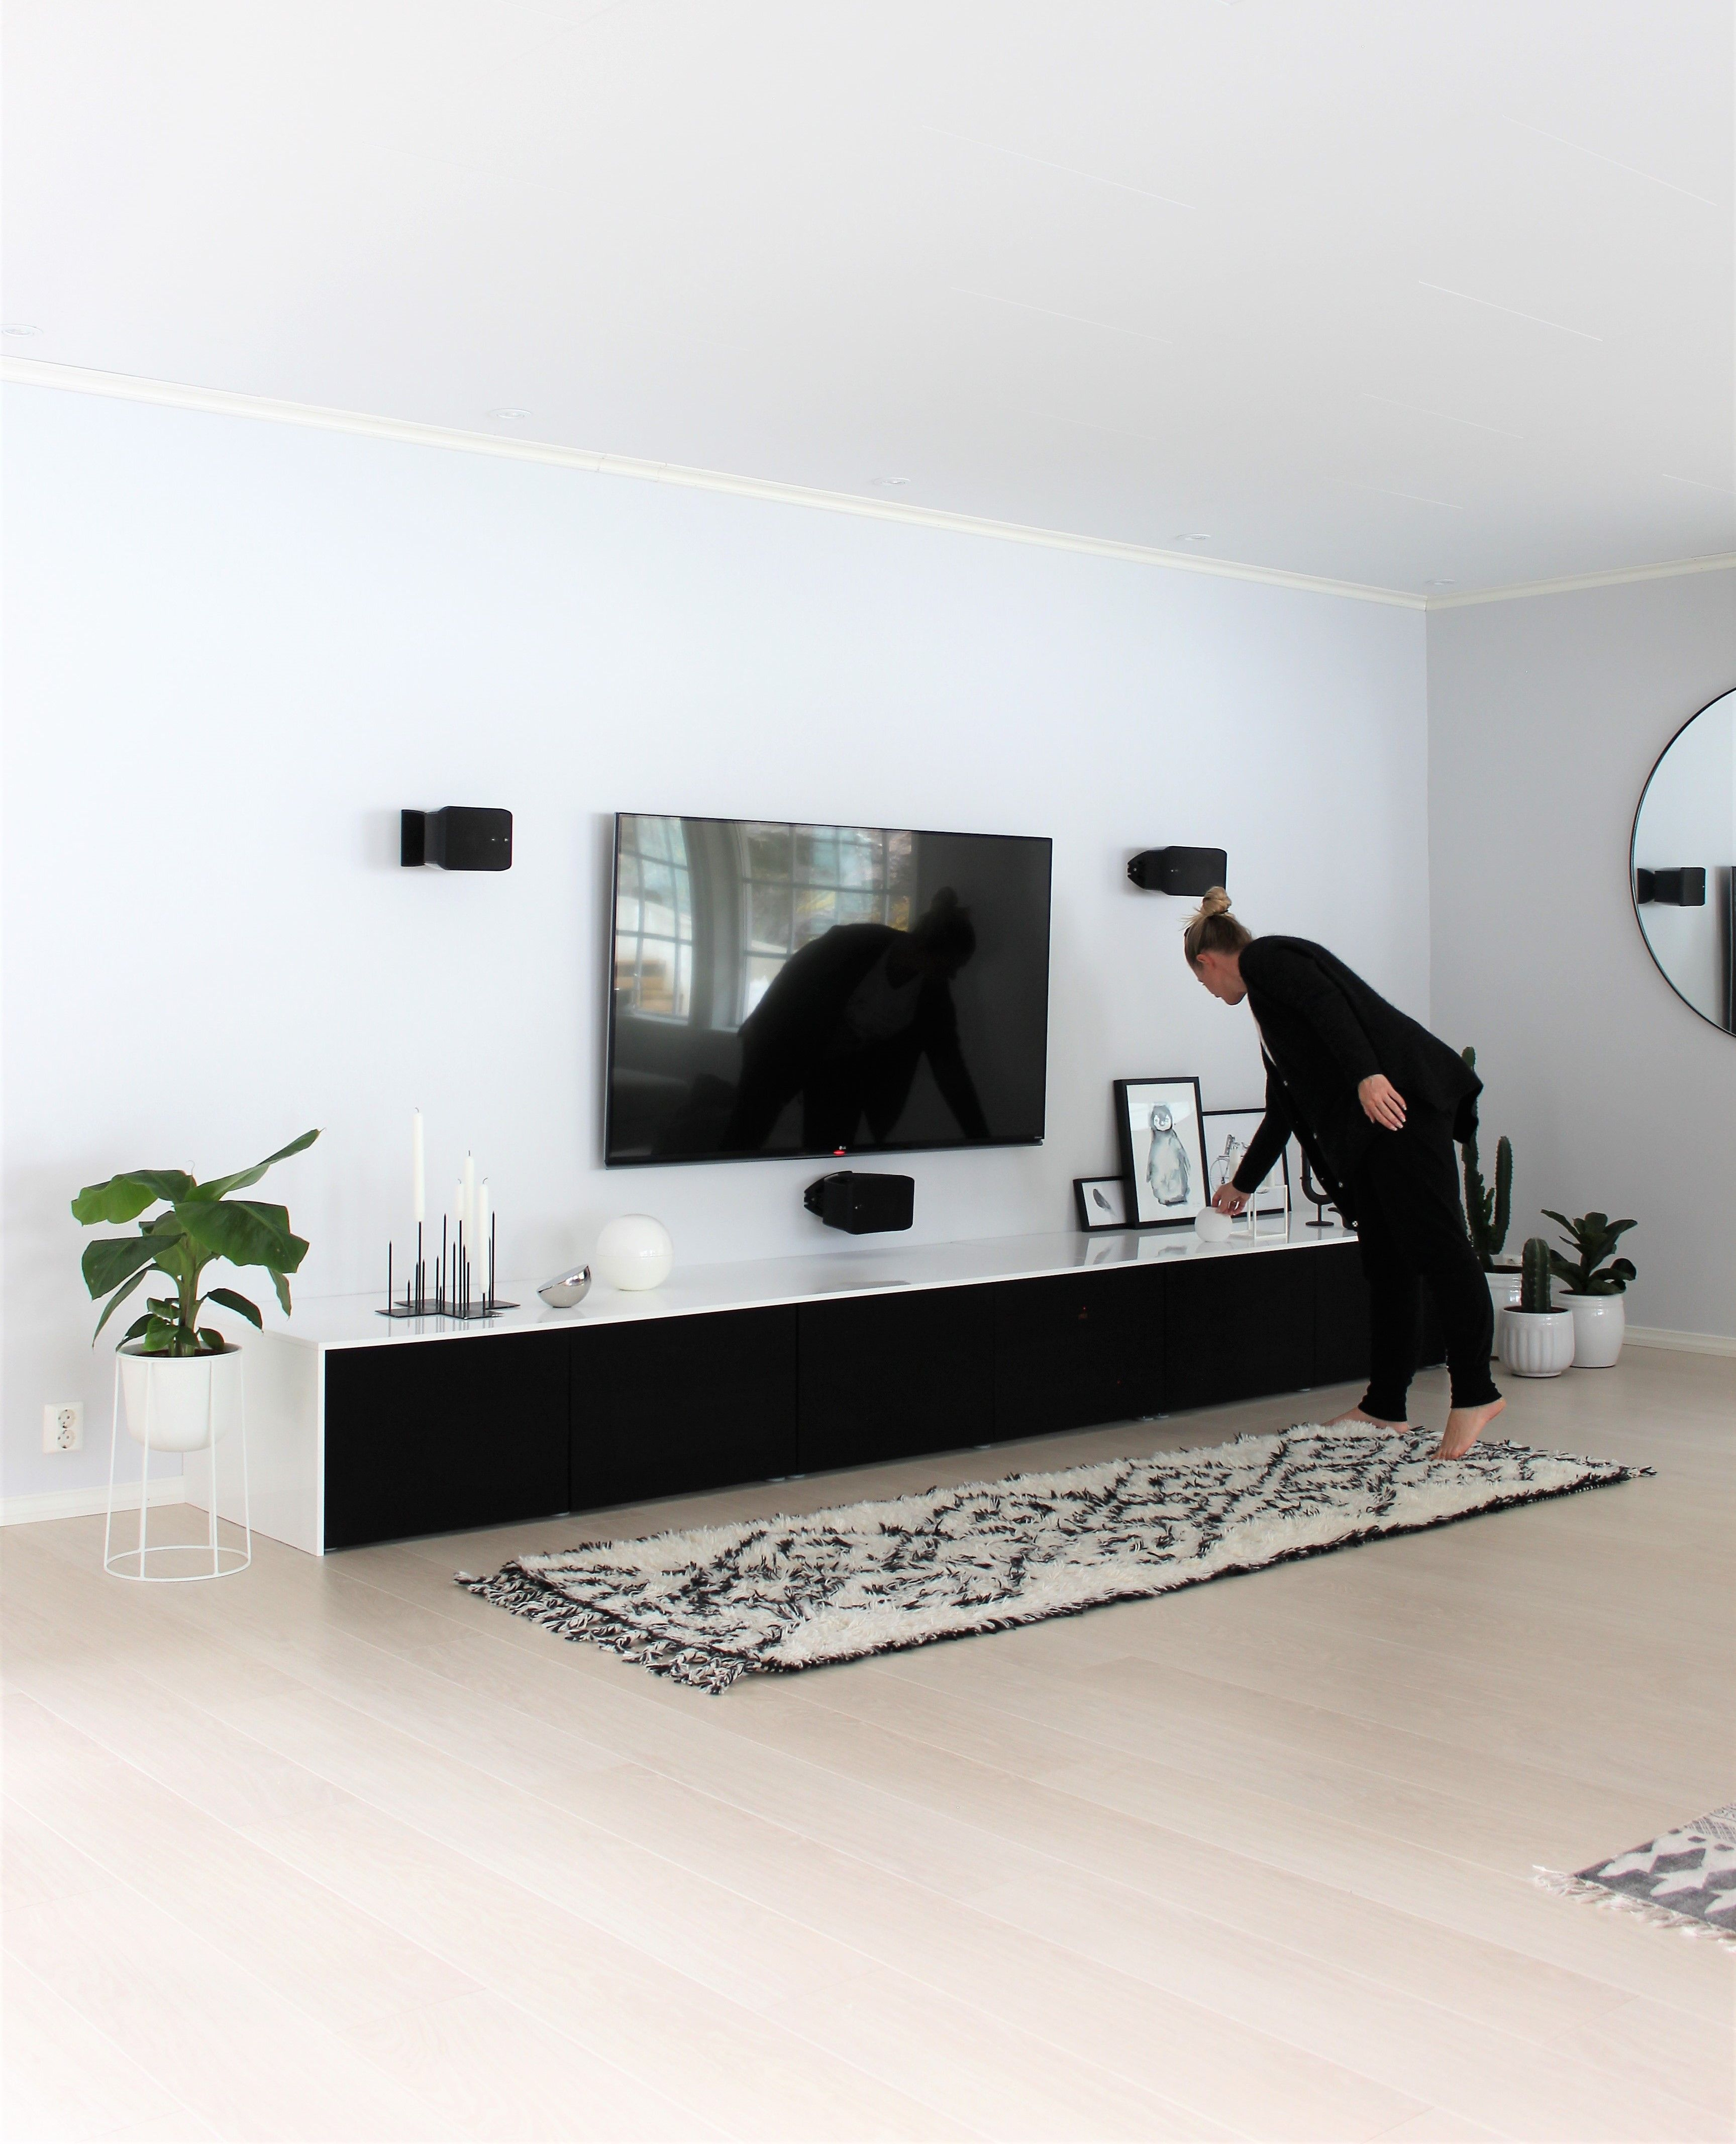 Tv Benk Fra Ikea Med Min Egen Tvist Vintage Wohnzimmer Wohnung